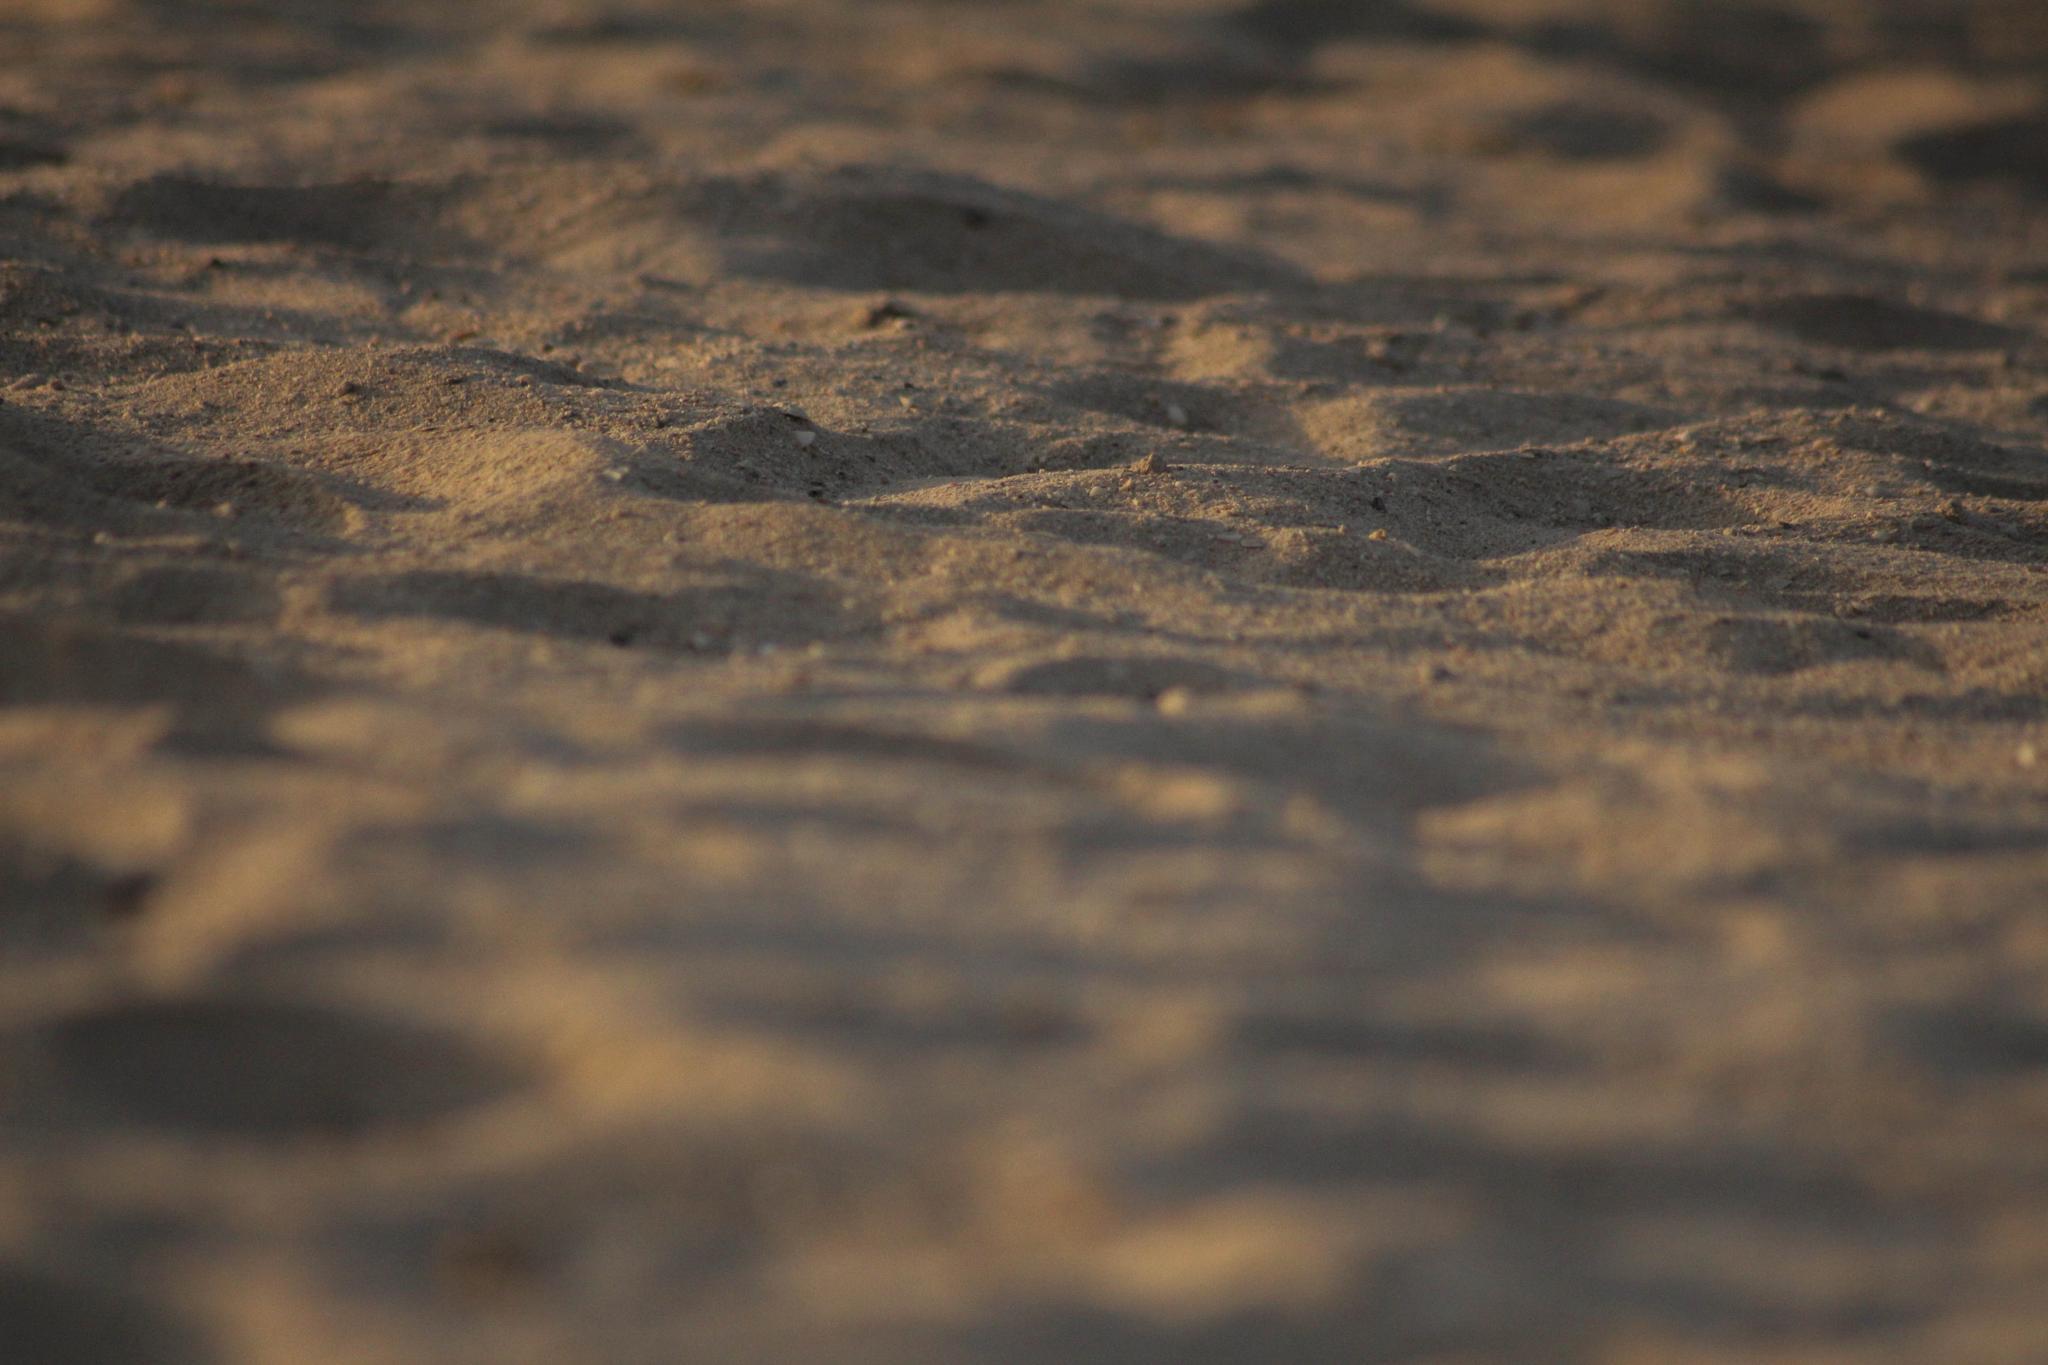 Sand tracks by Umar Shaiq